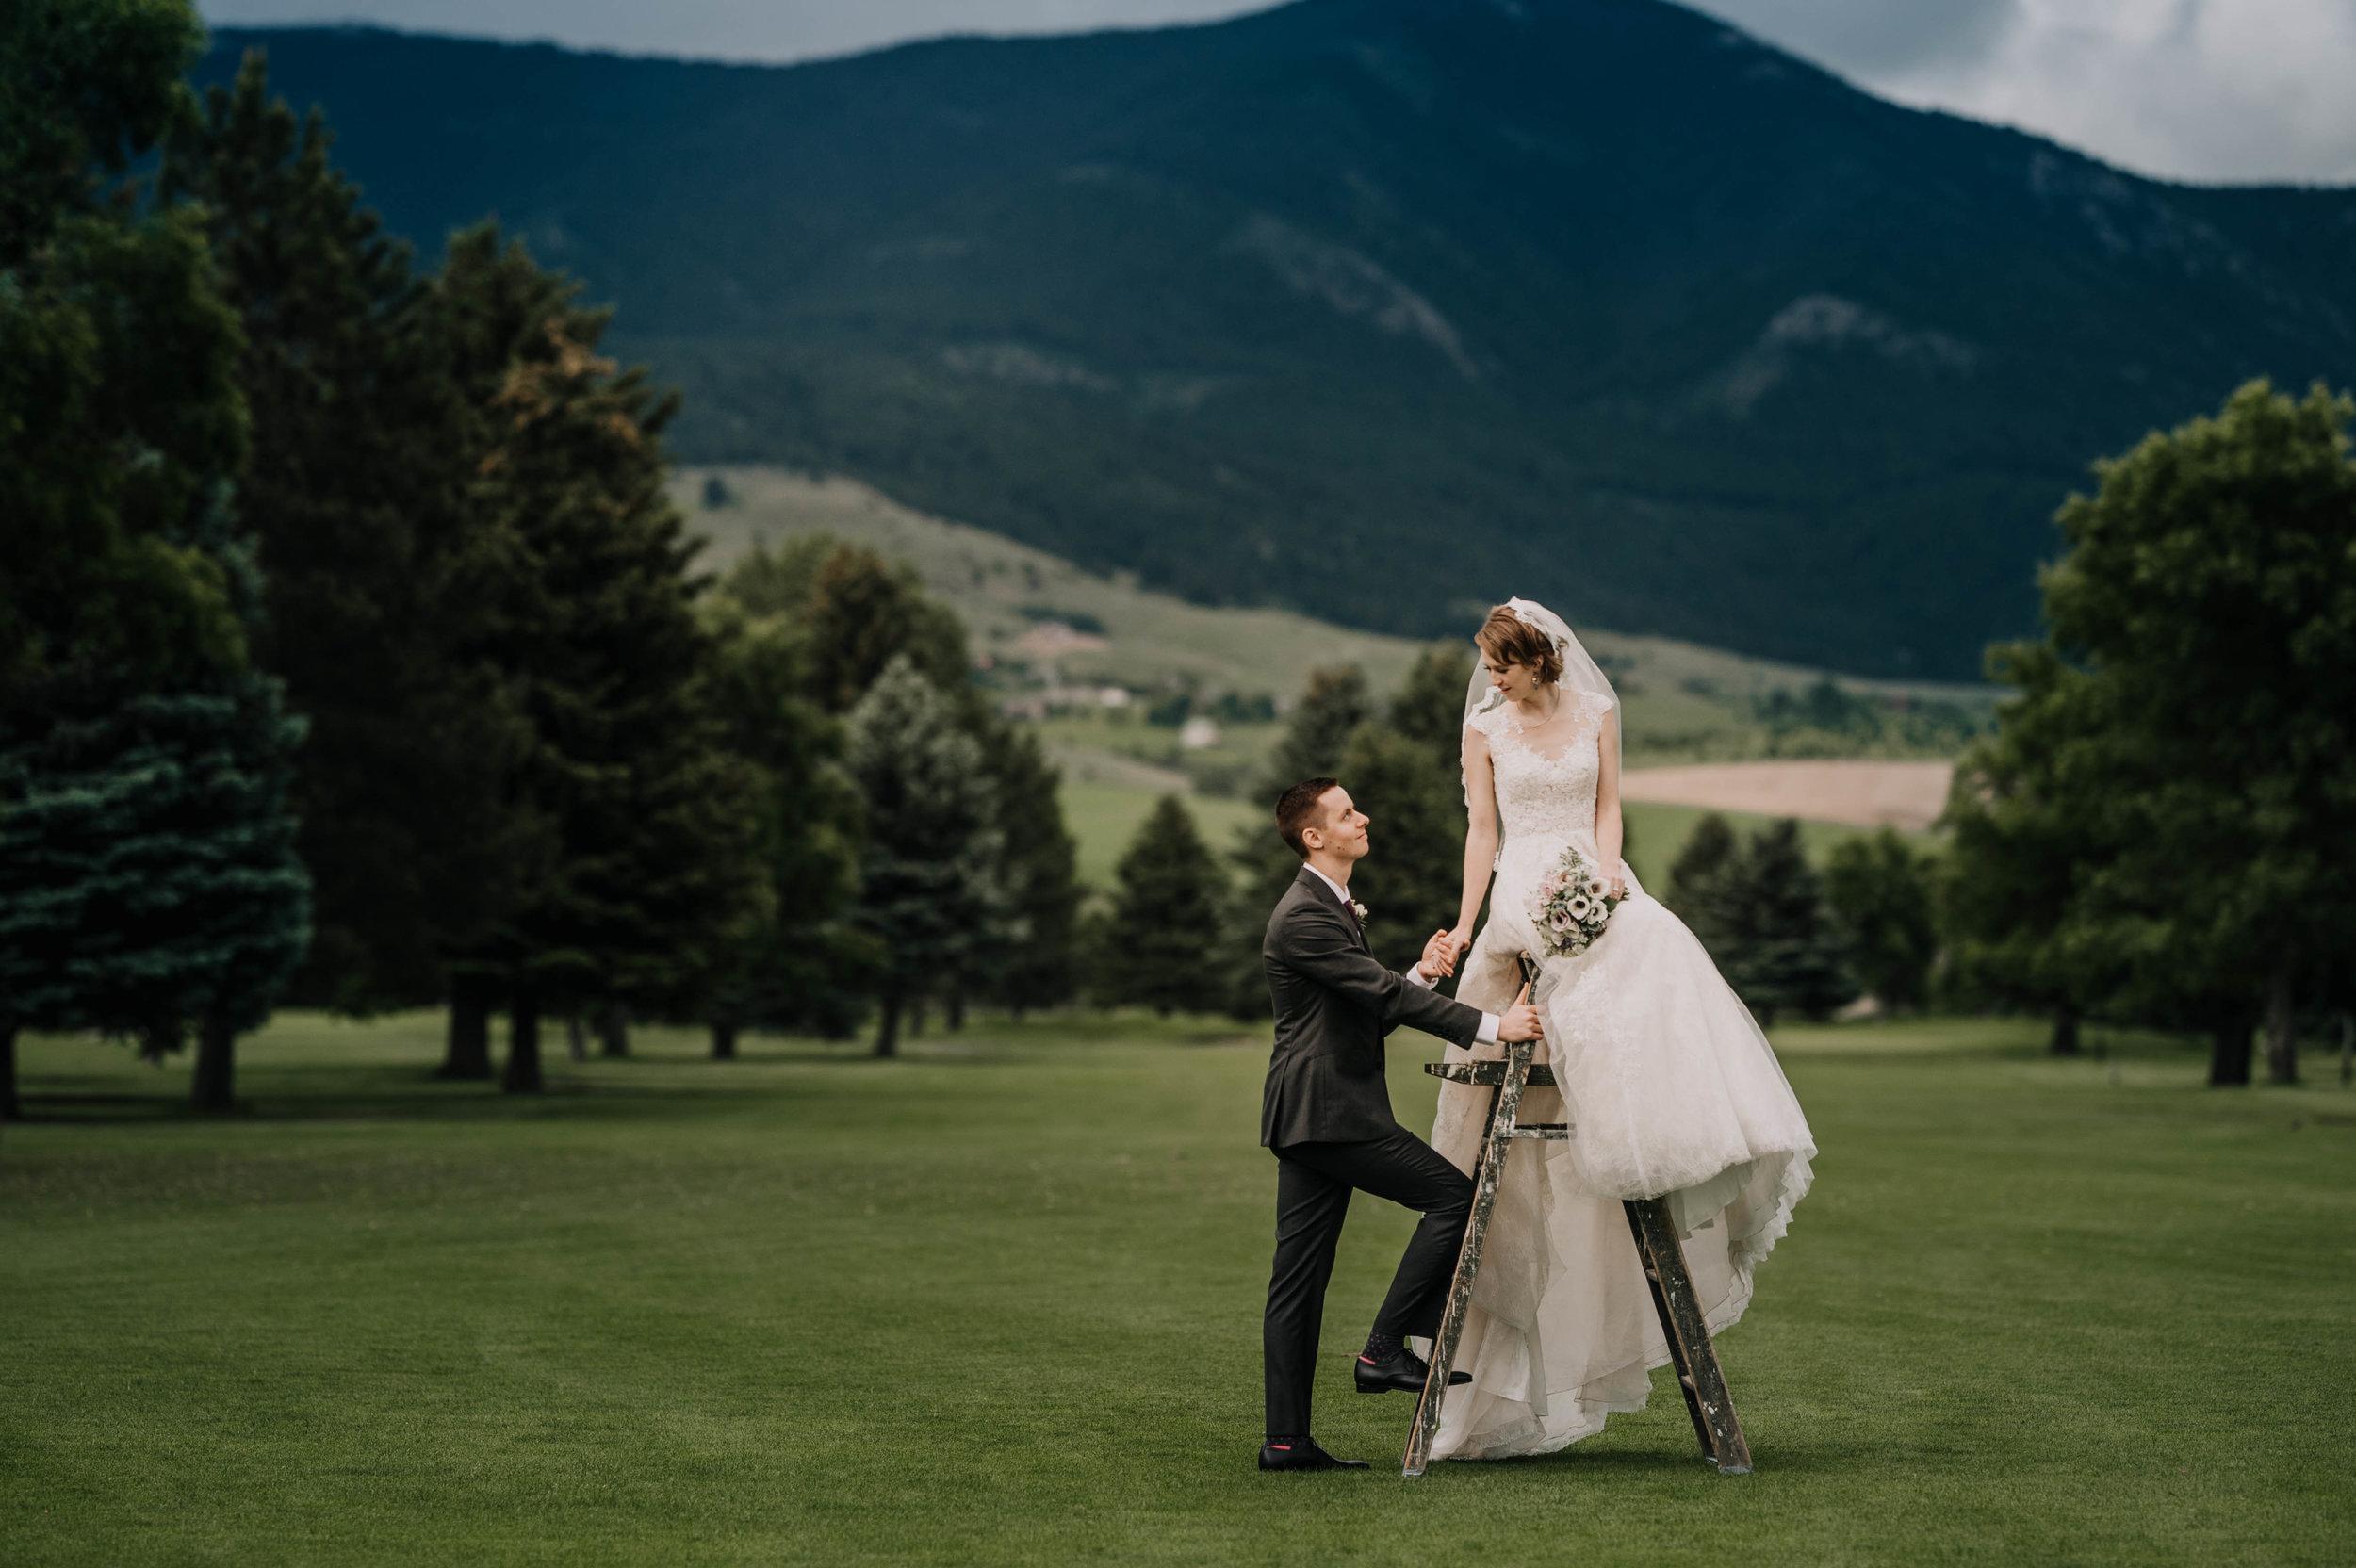 Riverside Country Club Wedding_Montana Wedding Photographer_Lauren Jackson + Evan Ivaldi 2018-6815.jpg